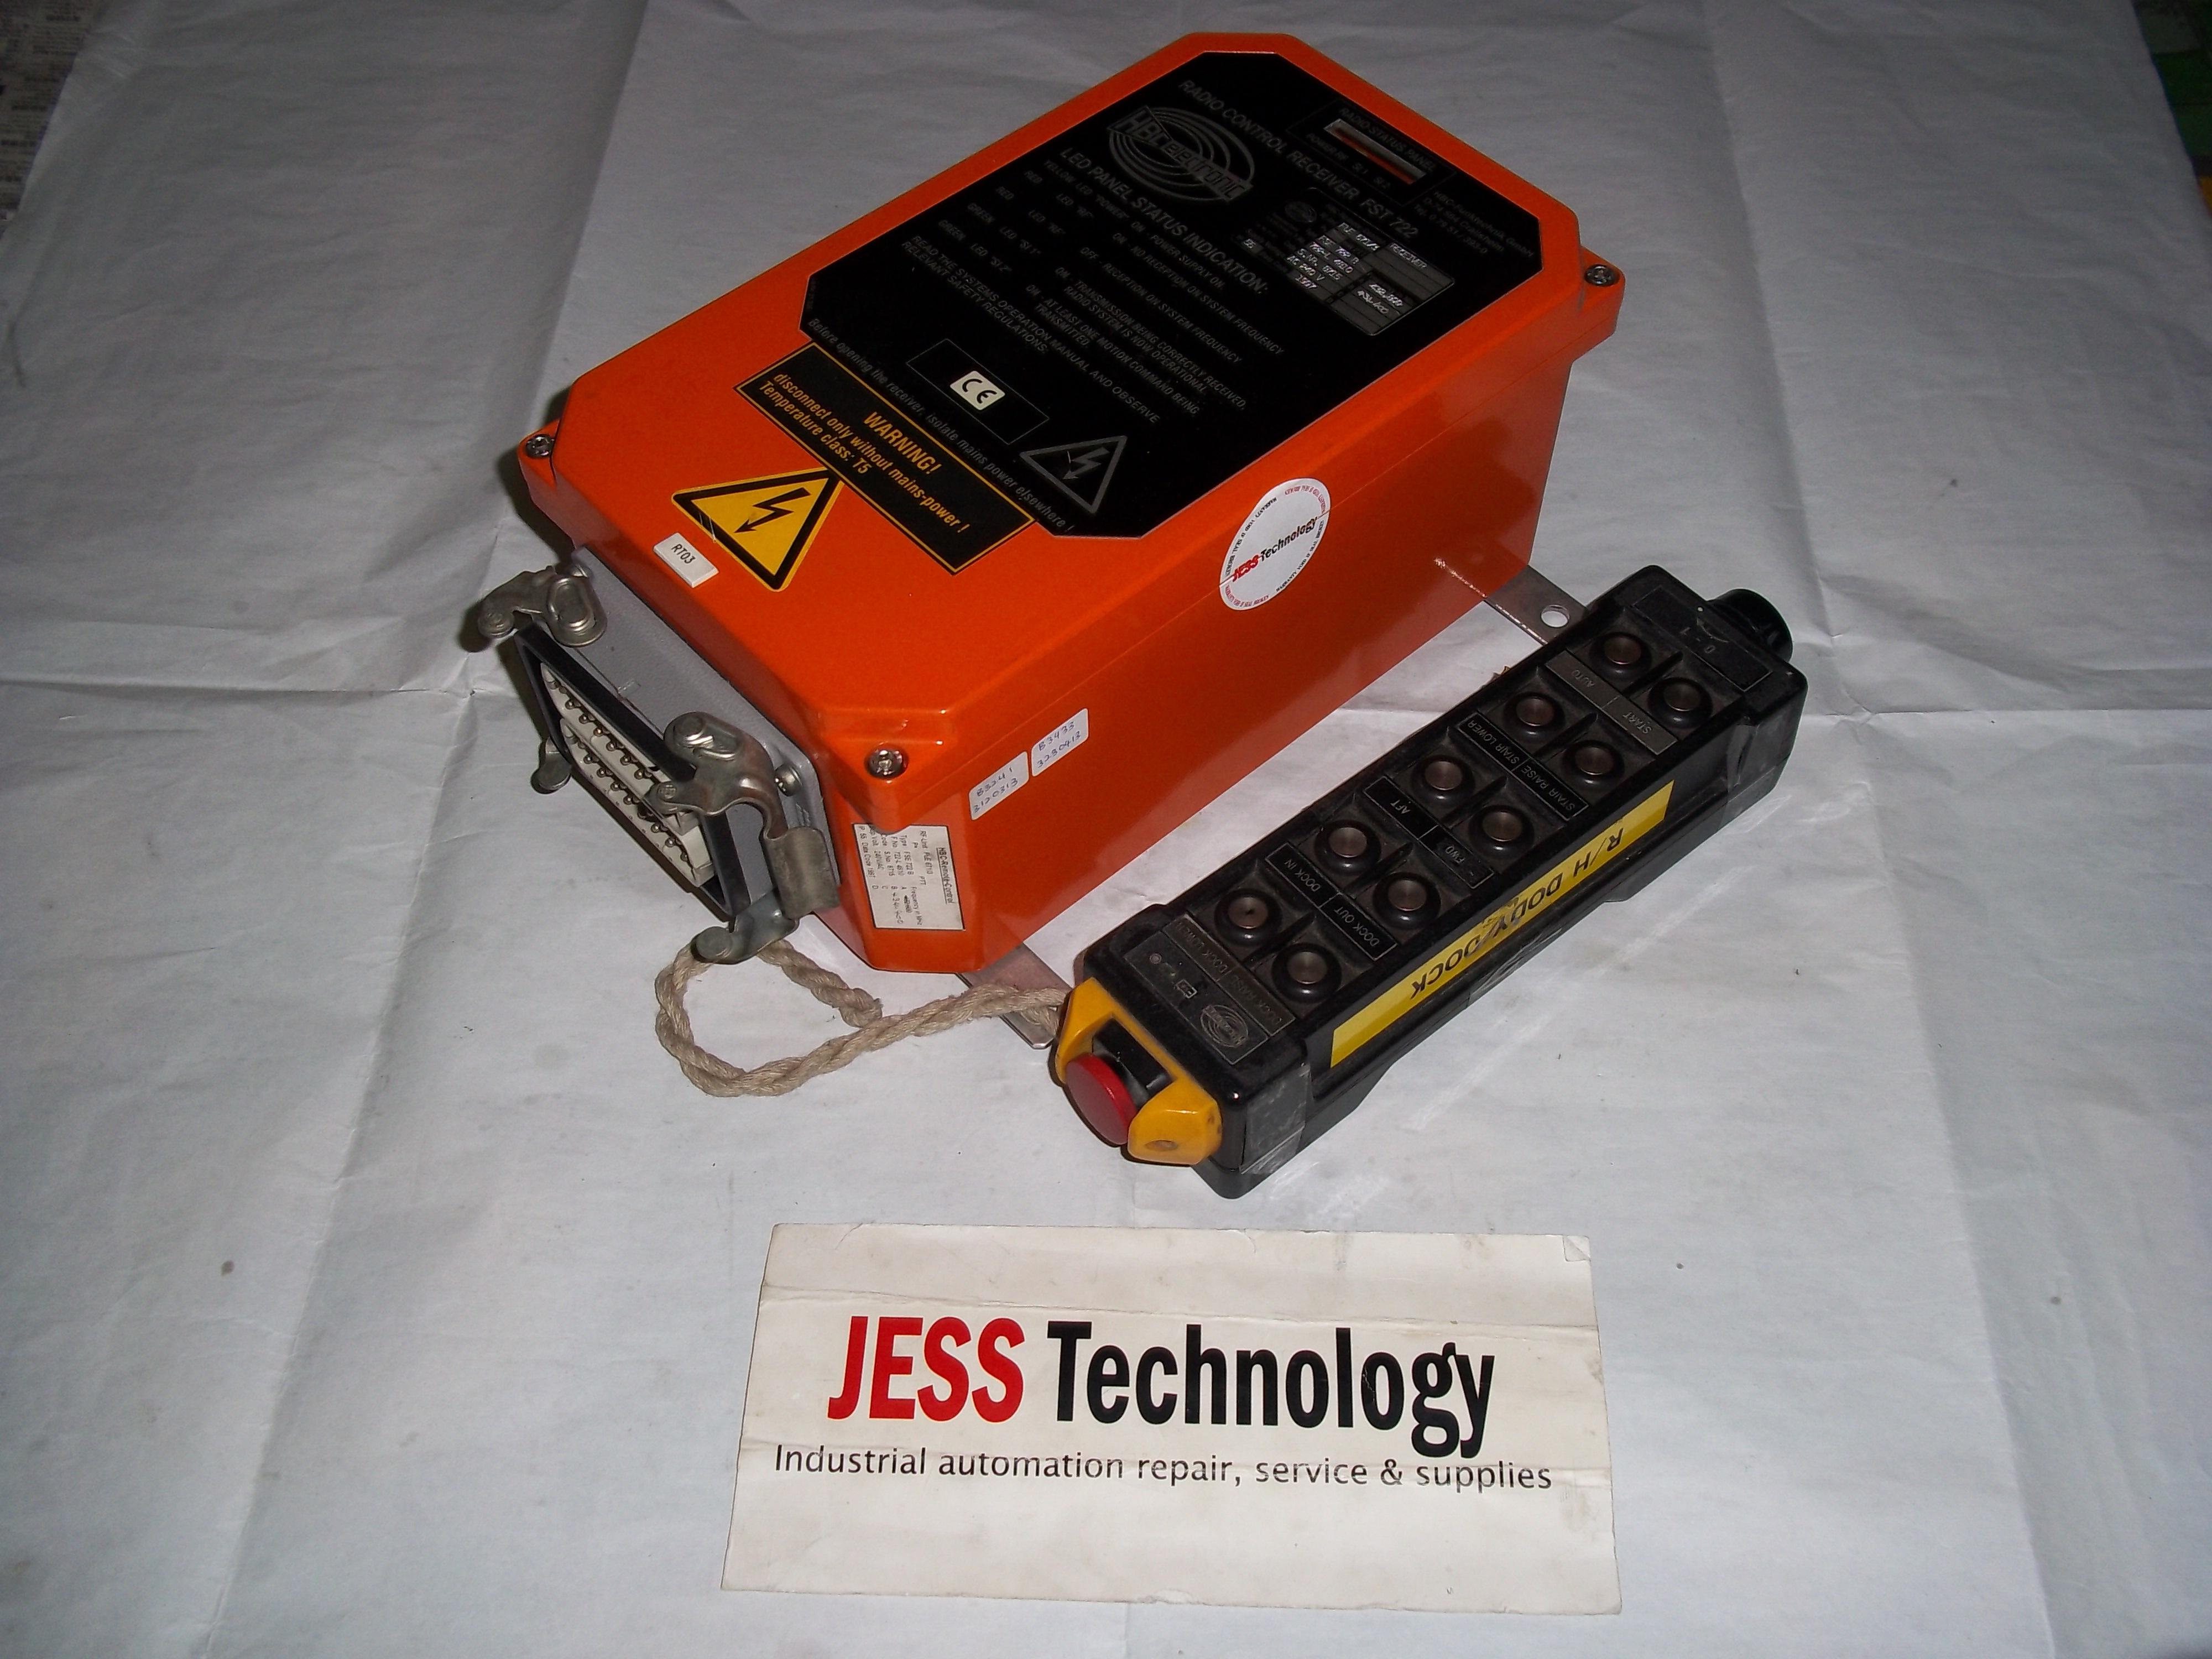 Repair FSE 722B HBC ELECTRONIC RADIO CONTROL RECIEVER FST 722 (FSE 722B)                                                       (UW B3241) in Malaysia, Singapore, Thailand, Indonesia